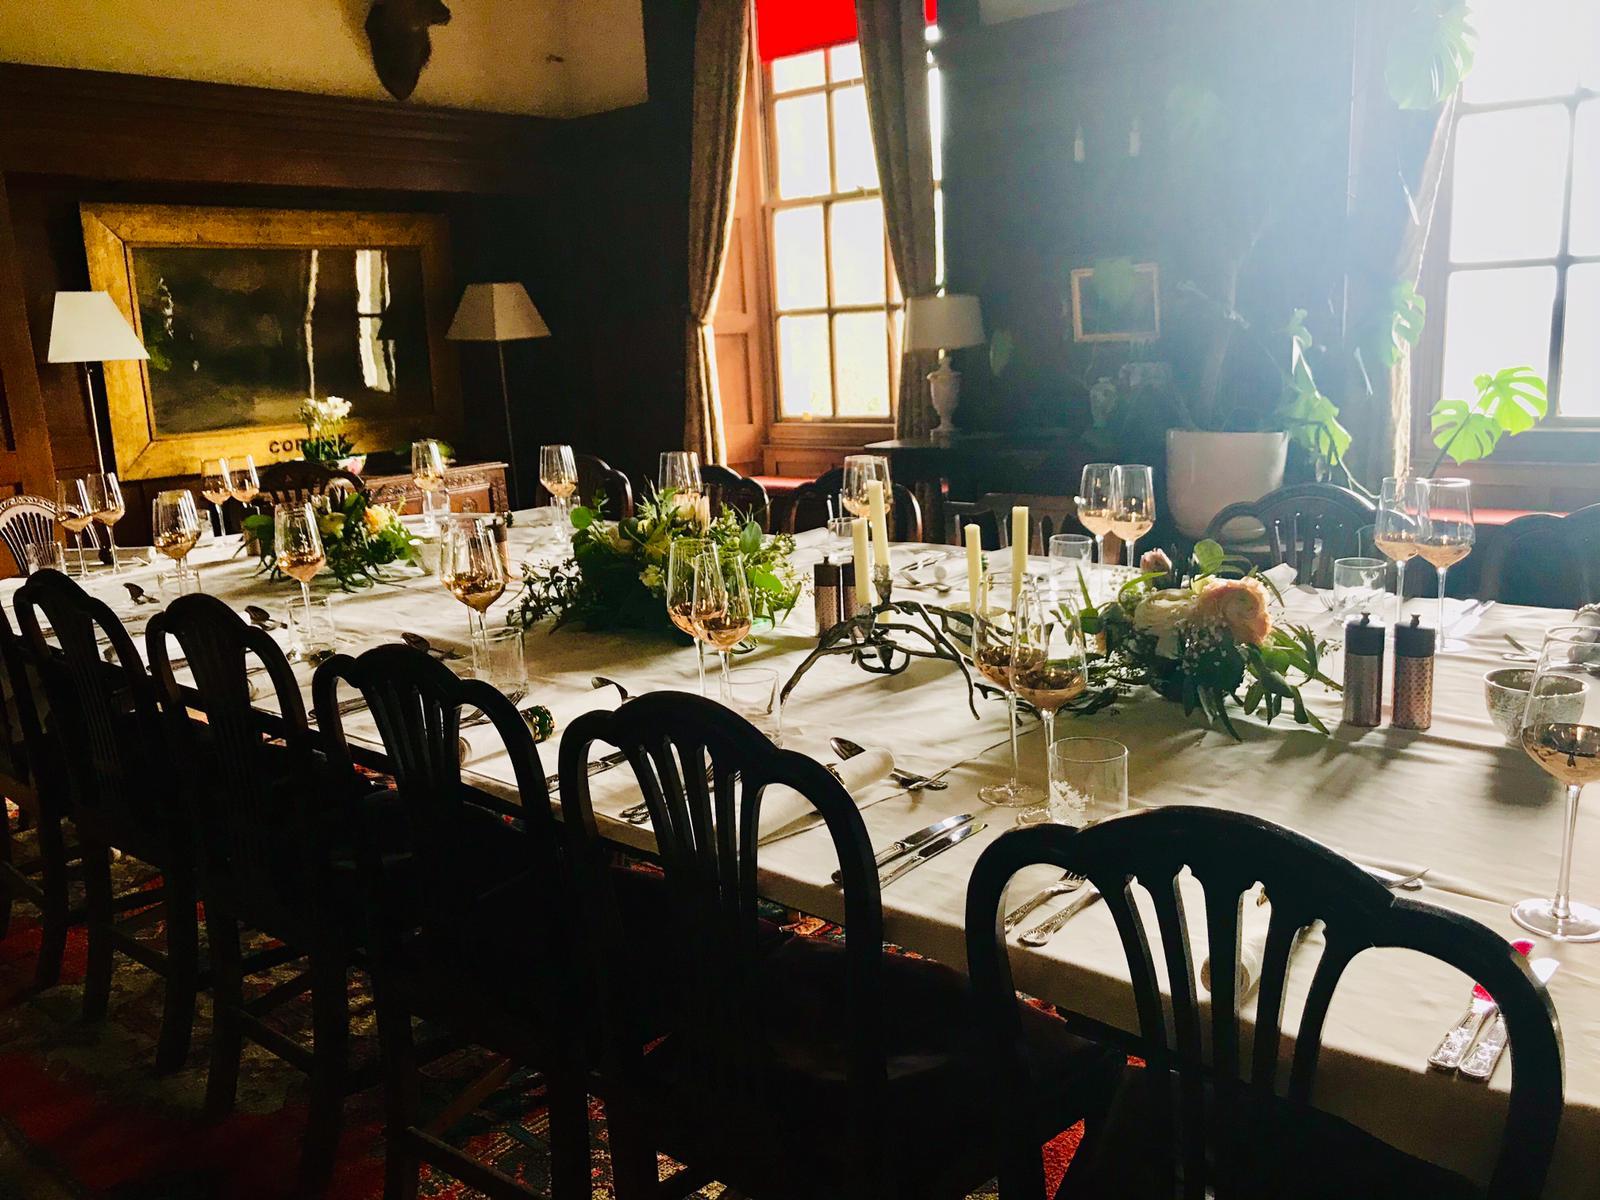 Medieval feast table spread